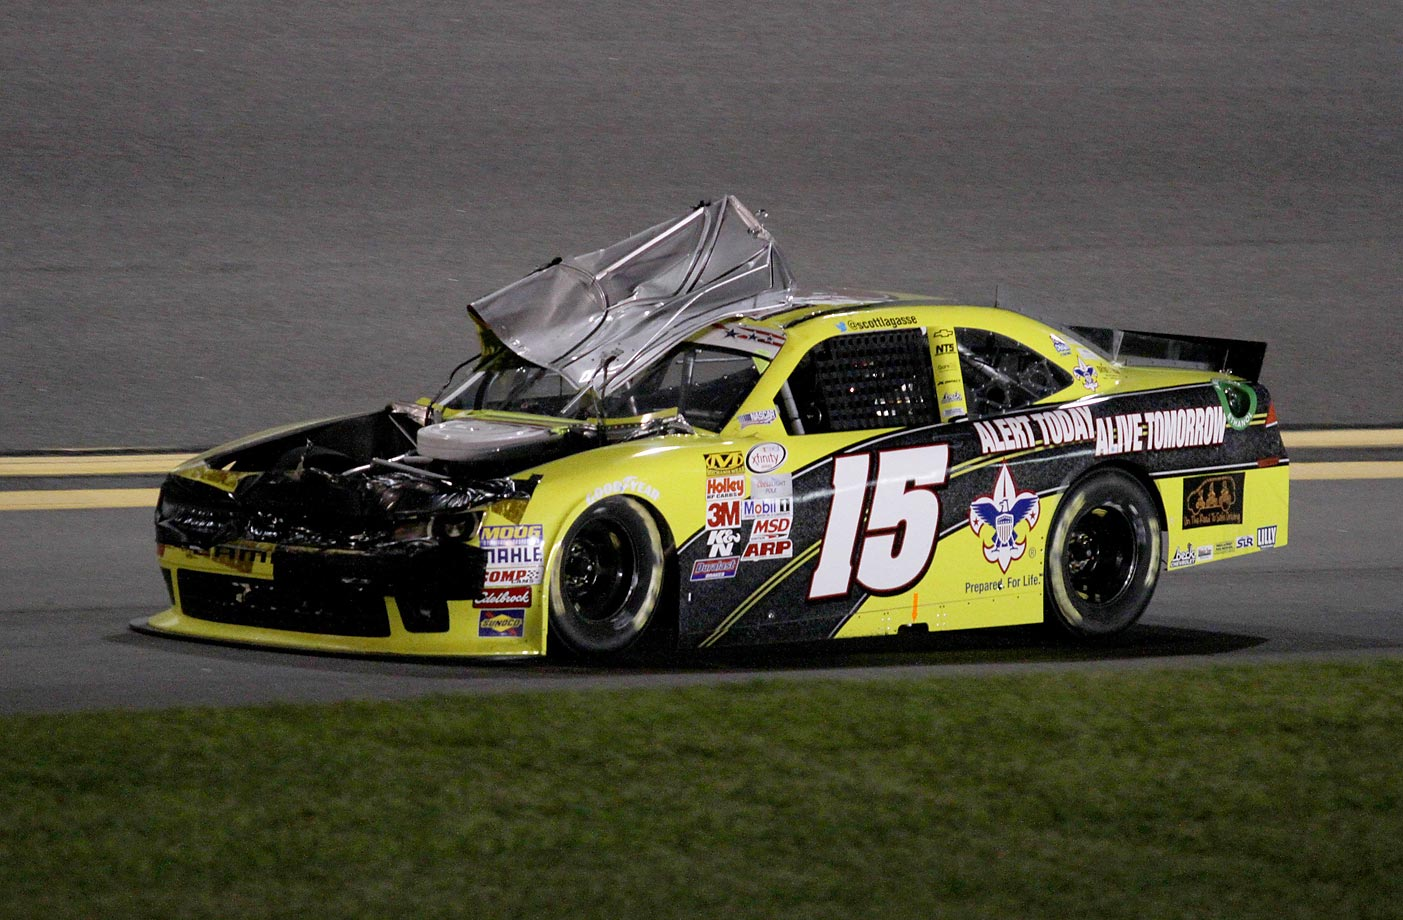 Scott Lagasse Jr. loses his hood during the NASCAR Xfinity Series Subway Firecracker 250 in Daytona.